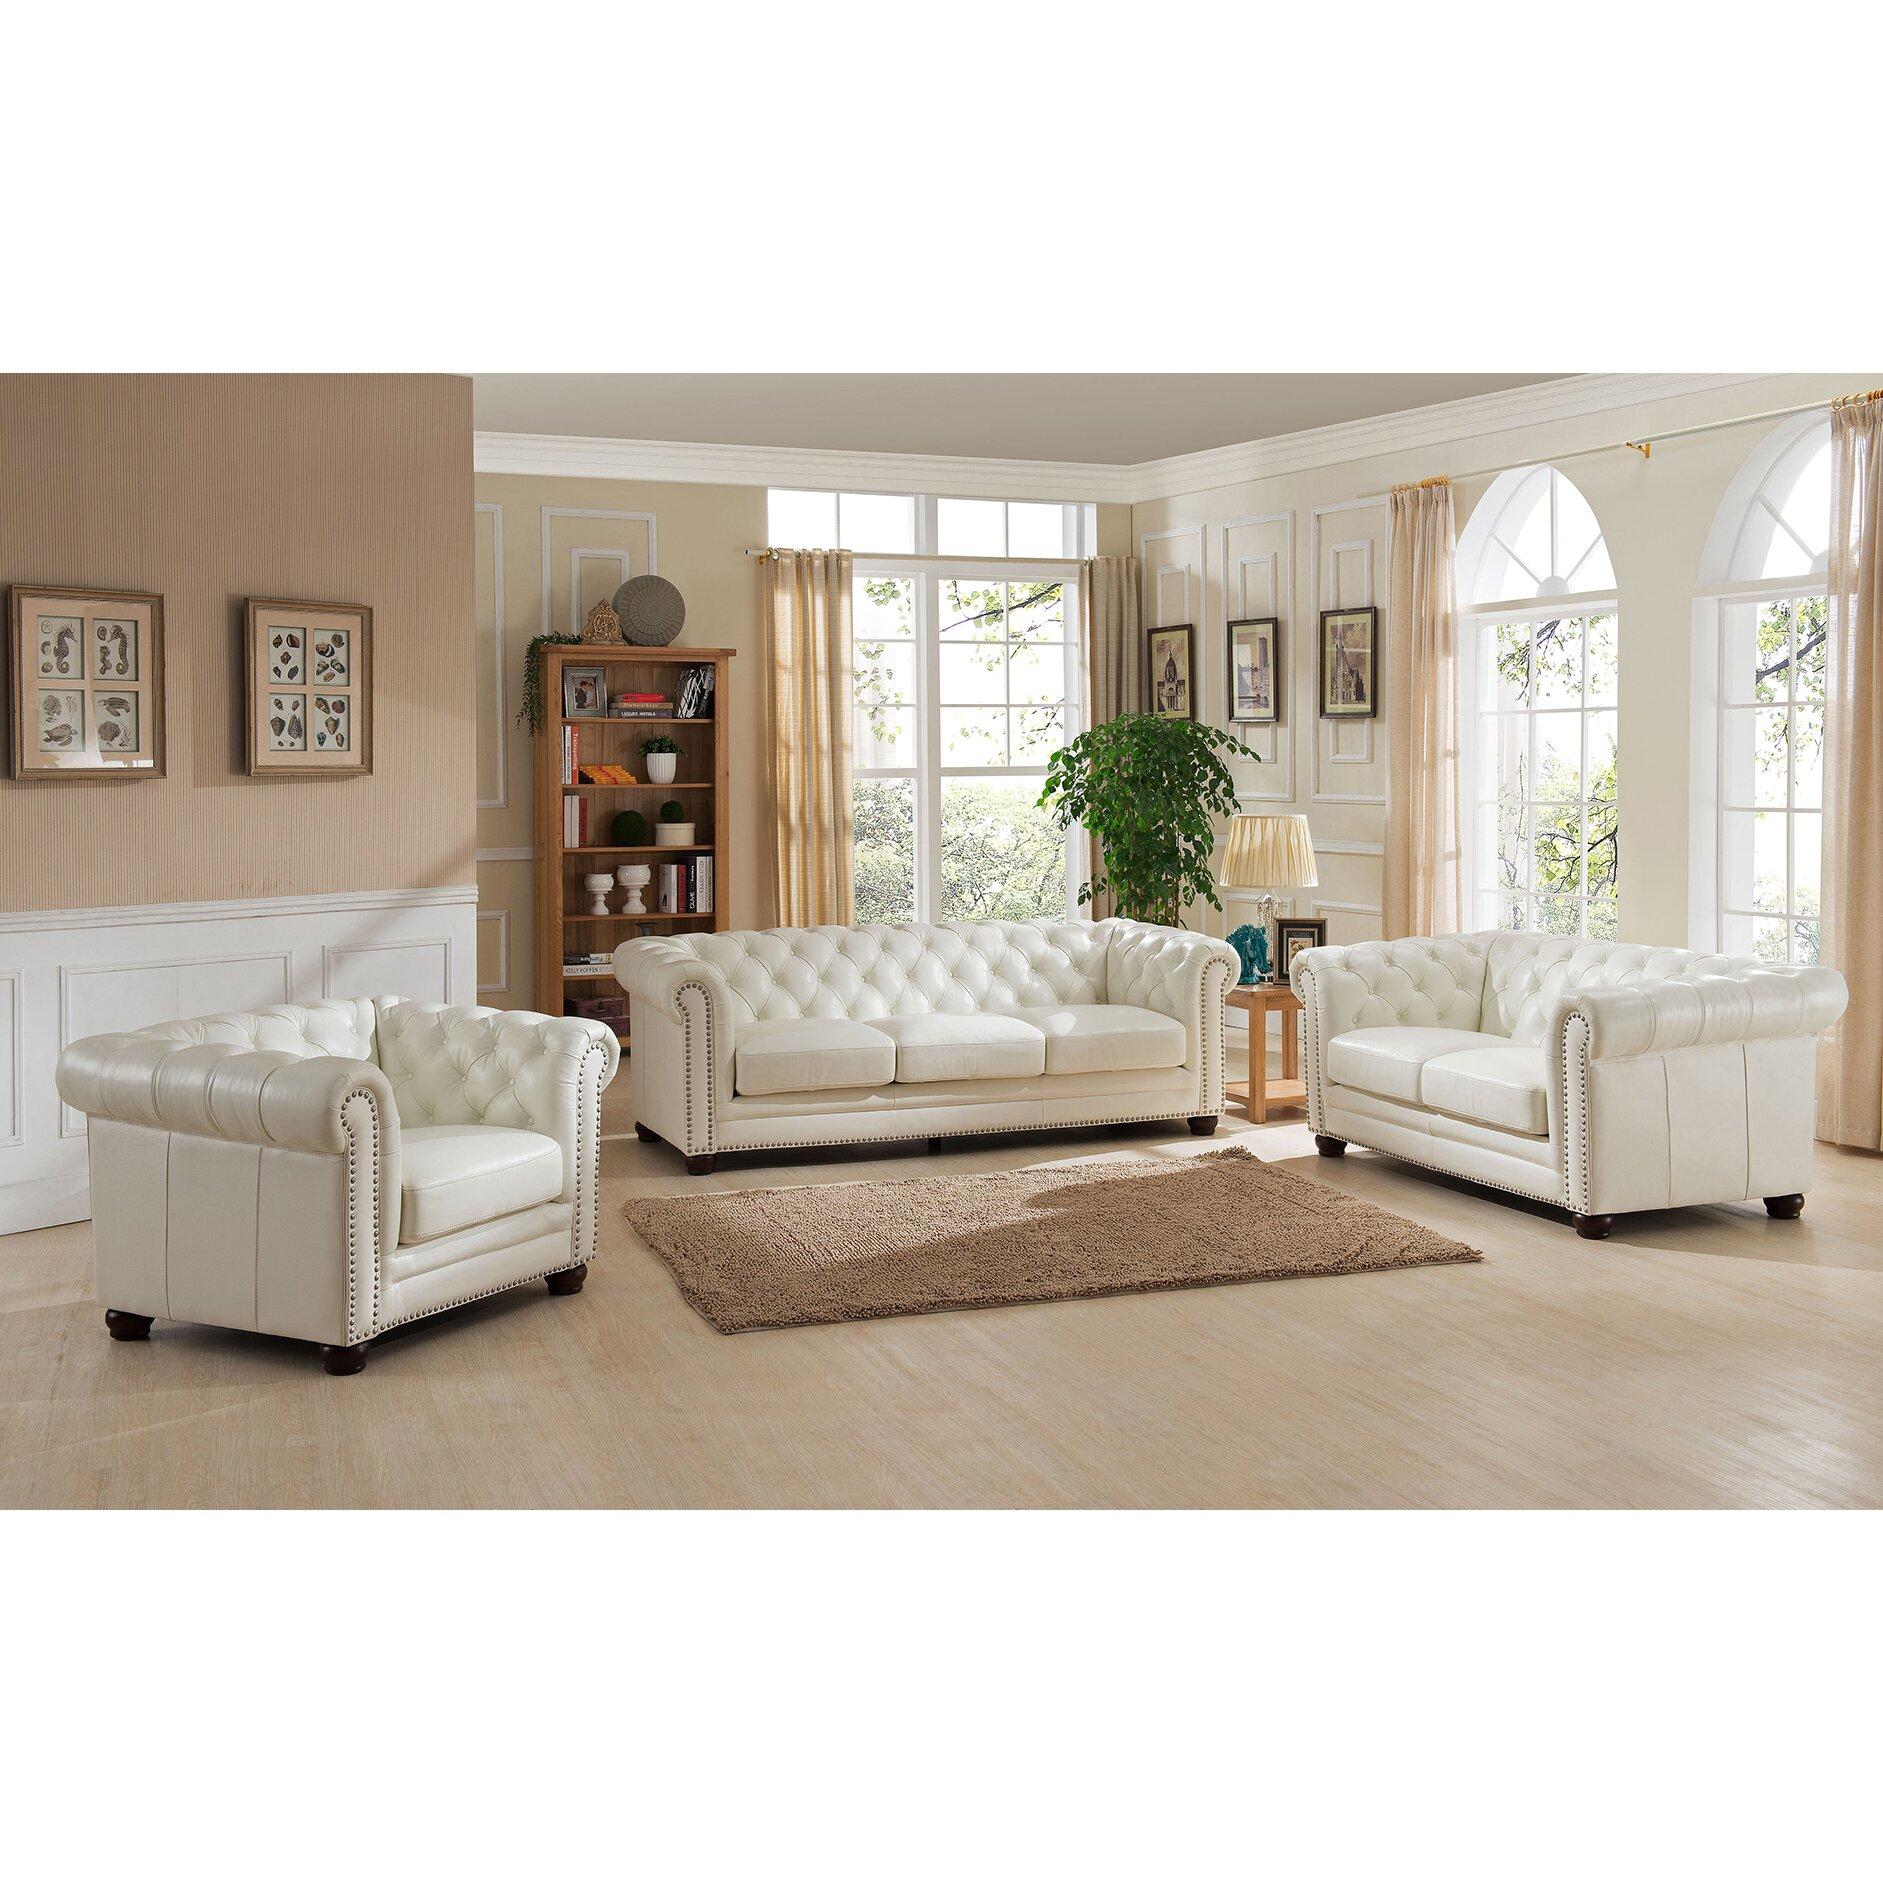 Nashville Tn Burleighvirtuallibraryus Primeclassicdesign Living Room Tables